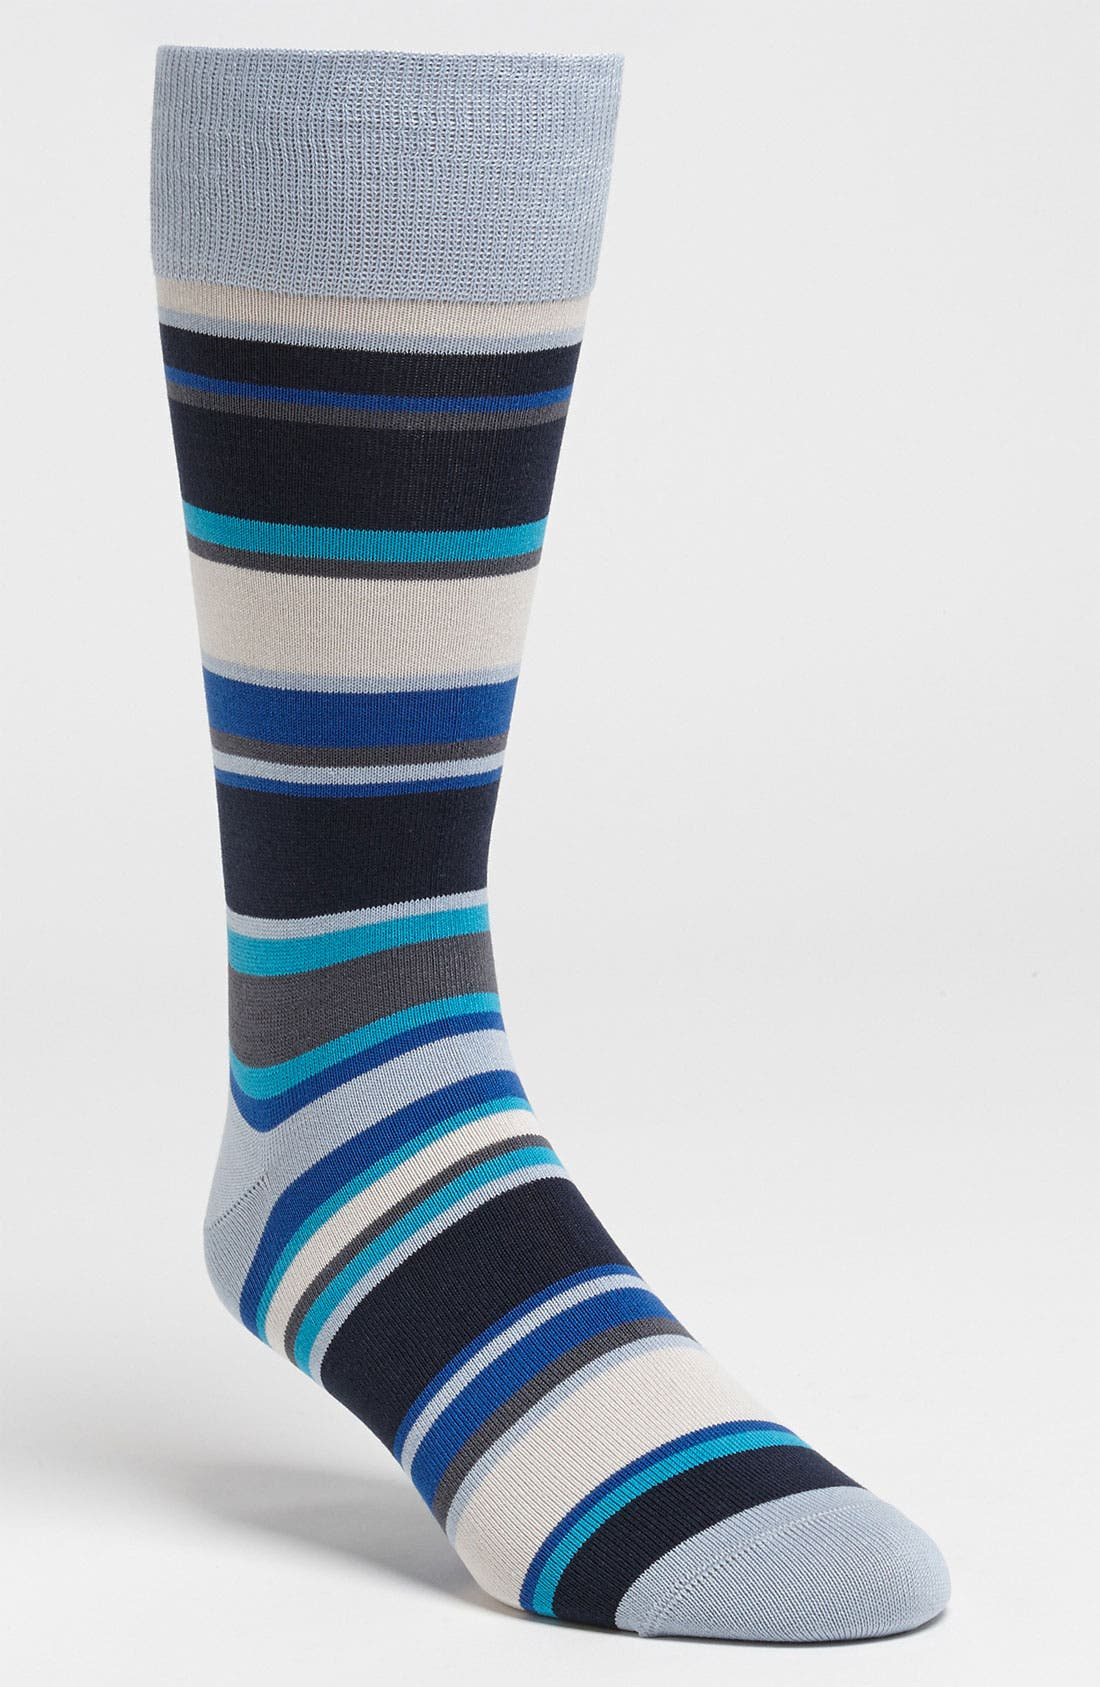 Main Image - Paul Smith Accessories 'London' Stripe Socks